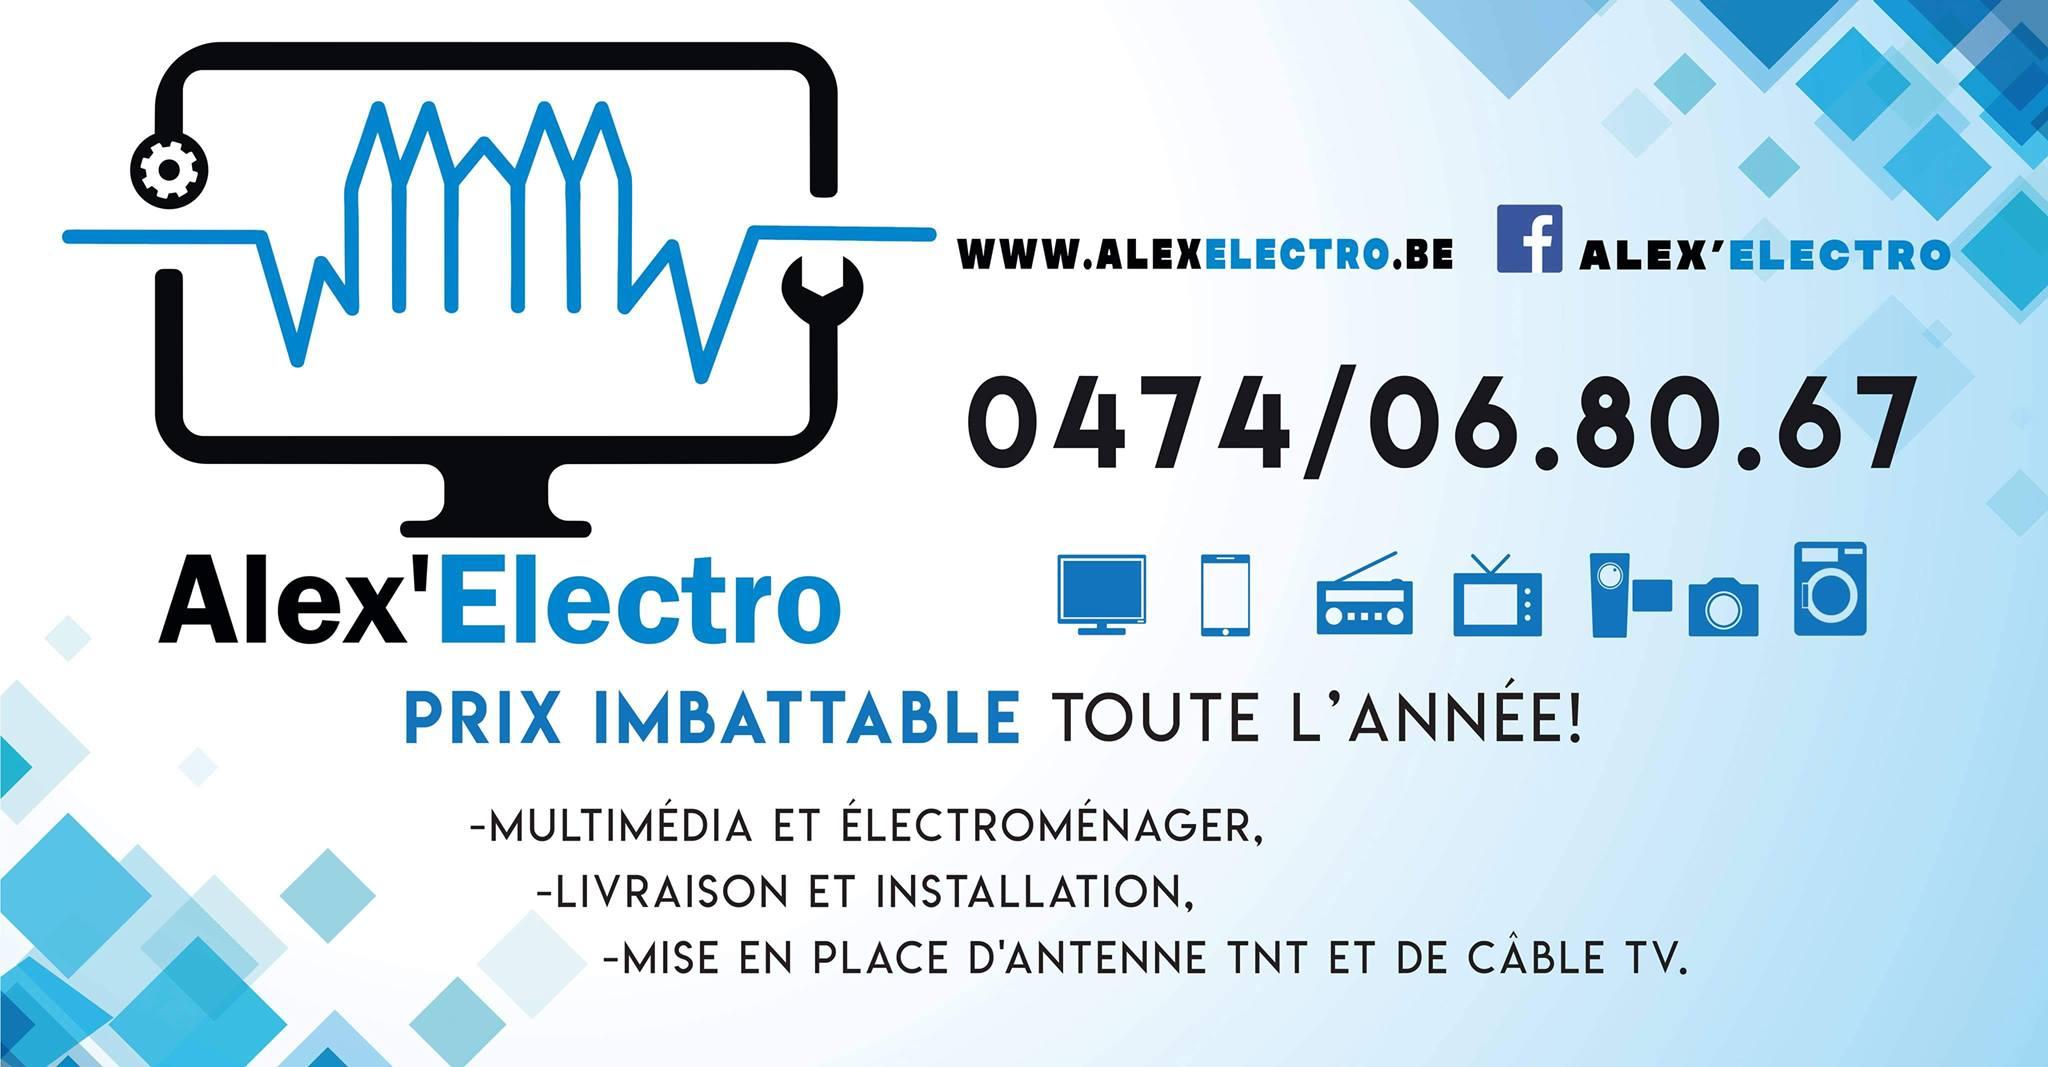 Alex'Electro